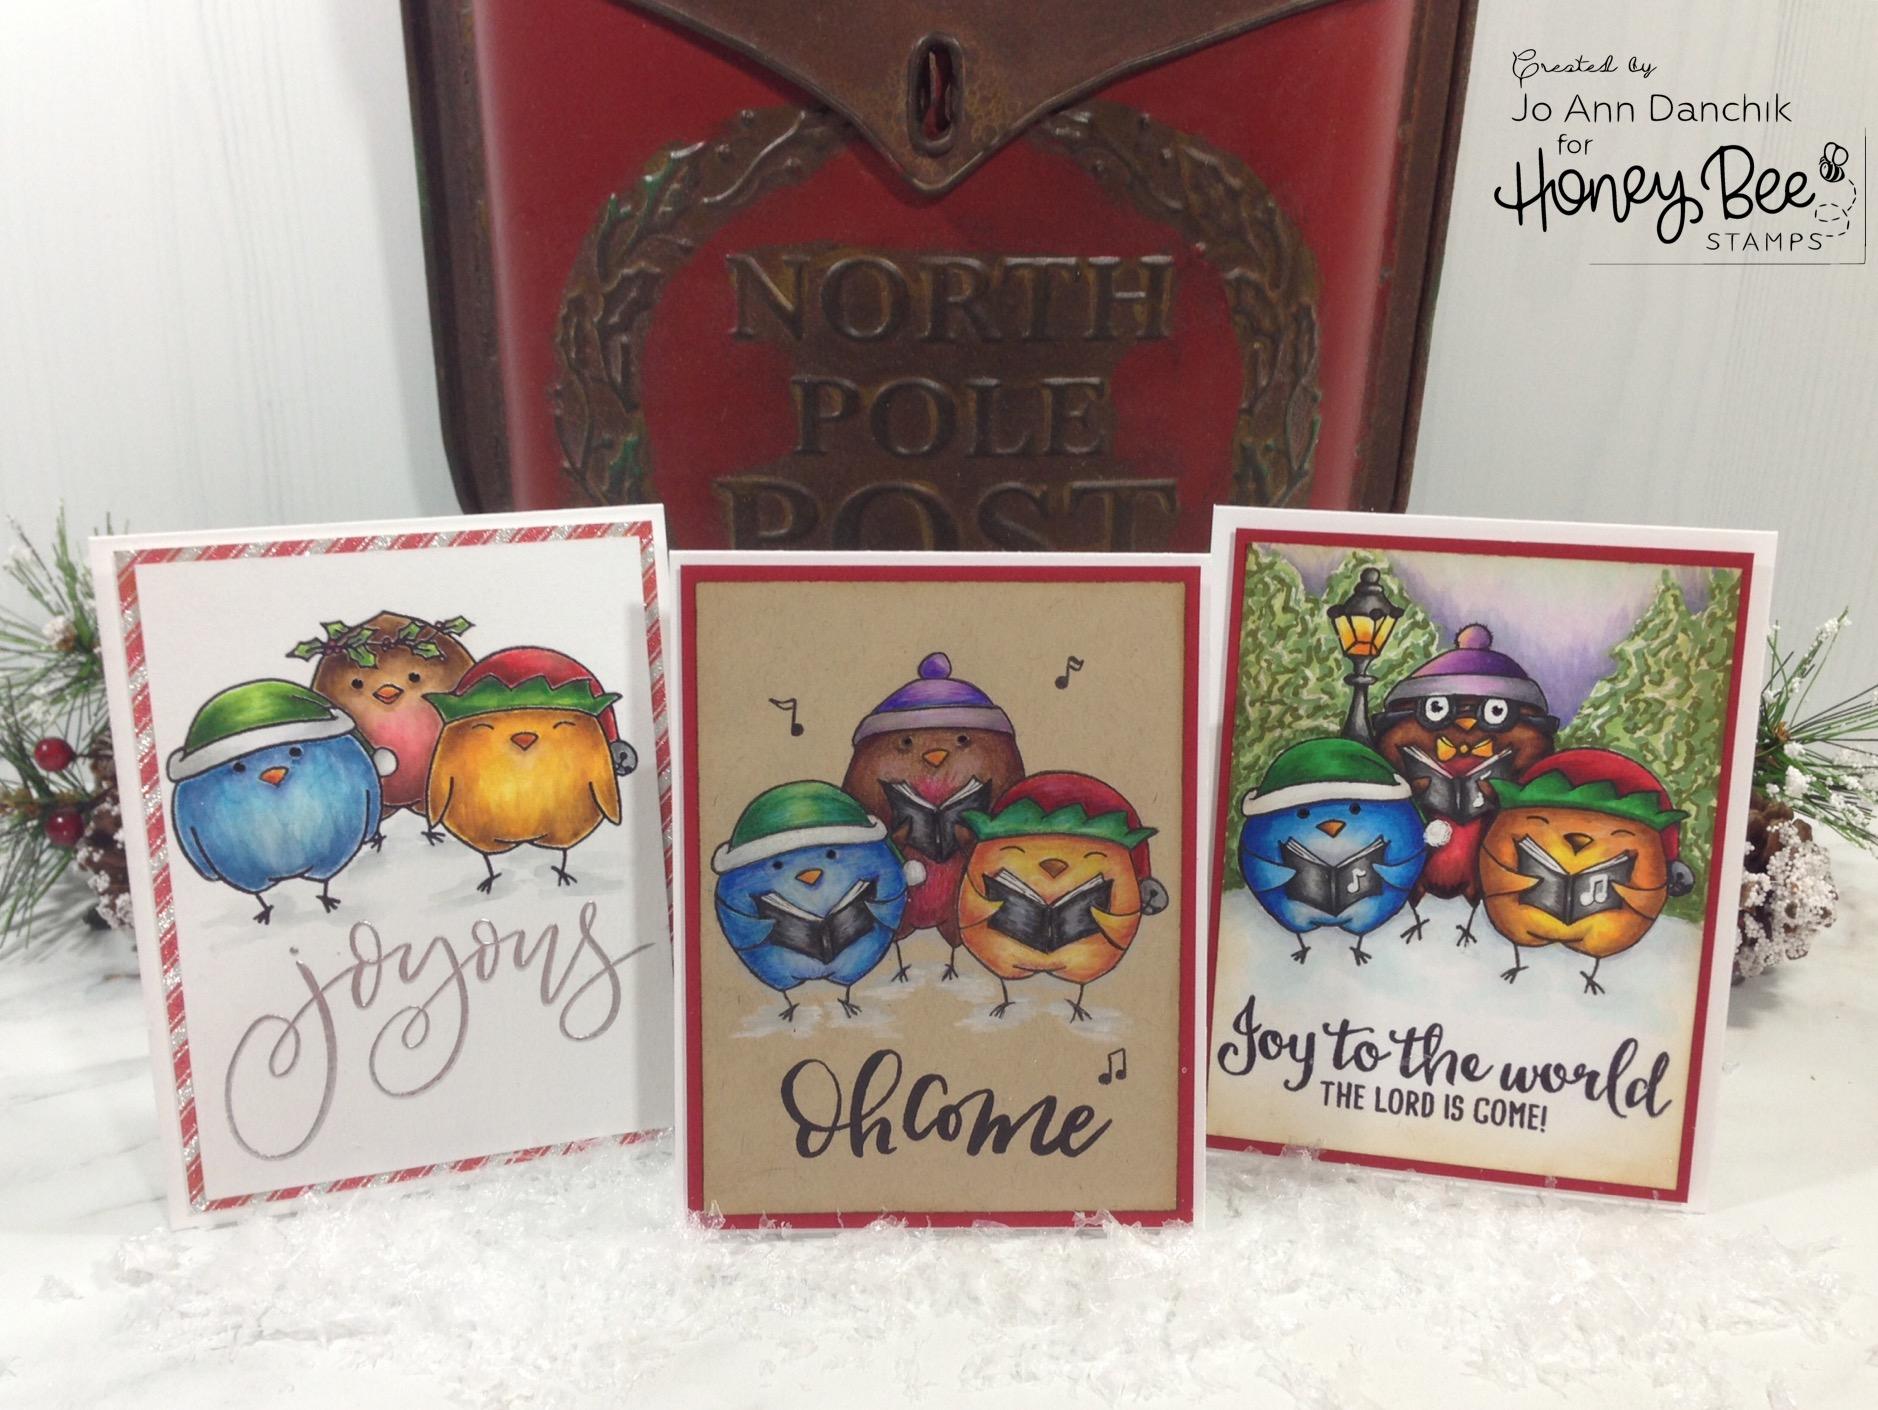 Creative Sundays with Jo Ann: Season's Tweetings – Three Cards…Three Mediums